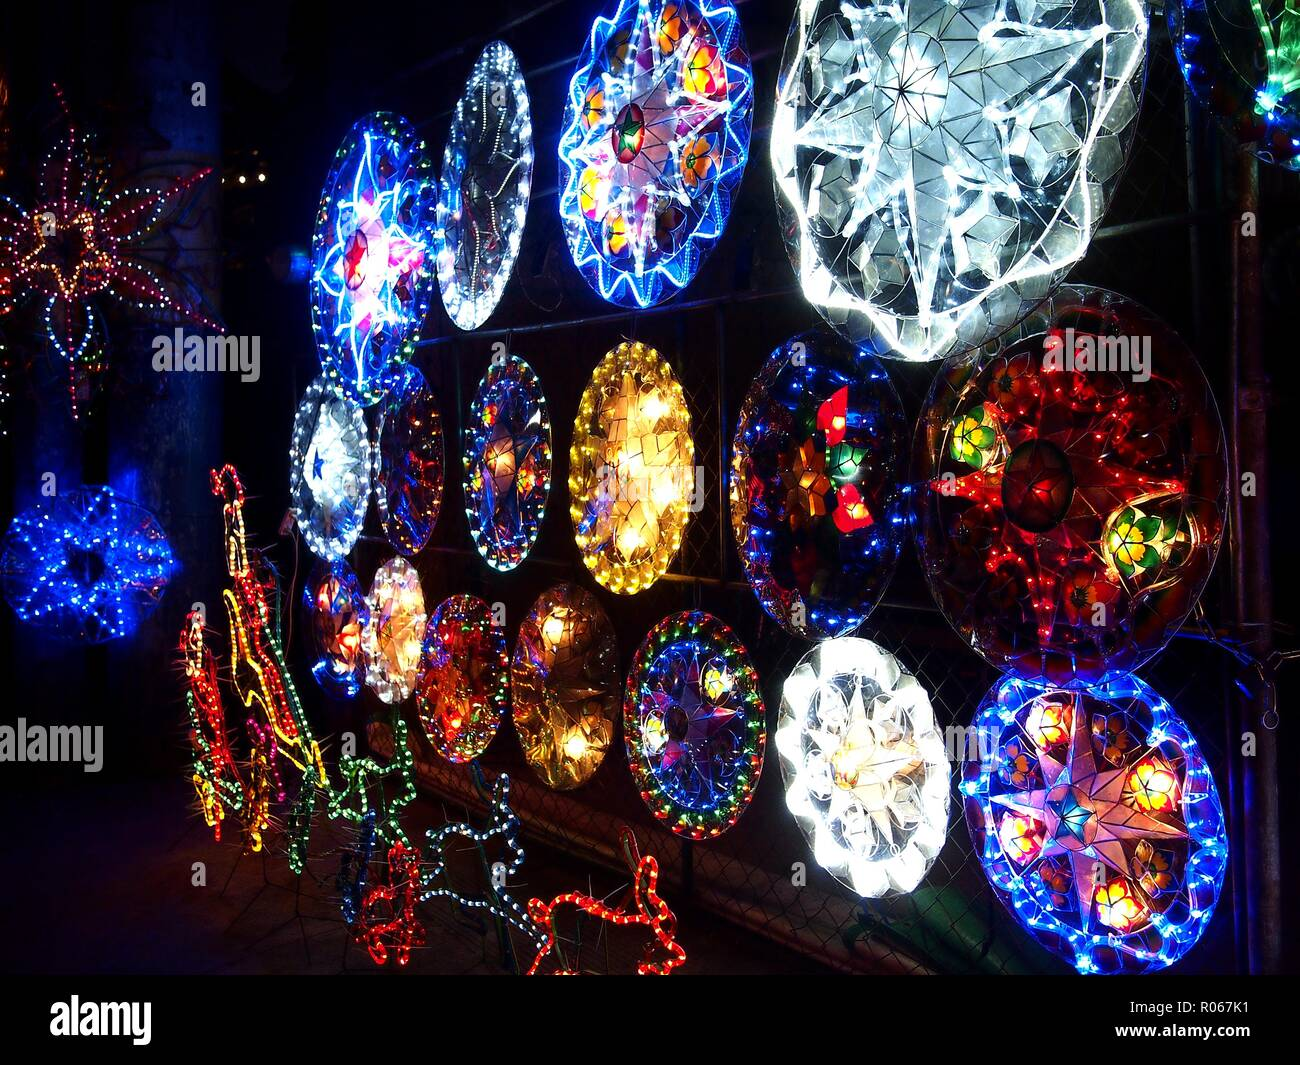 Christmas Lights In Pampanga.Photo Of Colorful Christmas Lanterns On Display At A Store